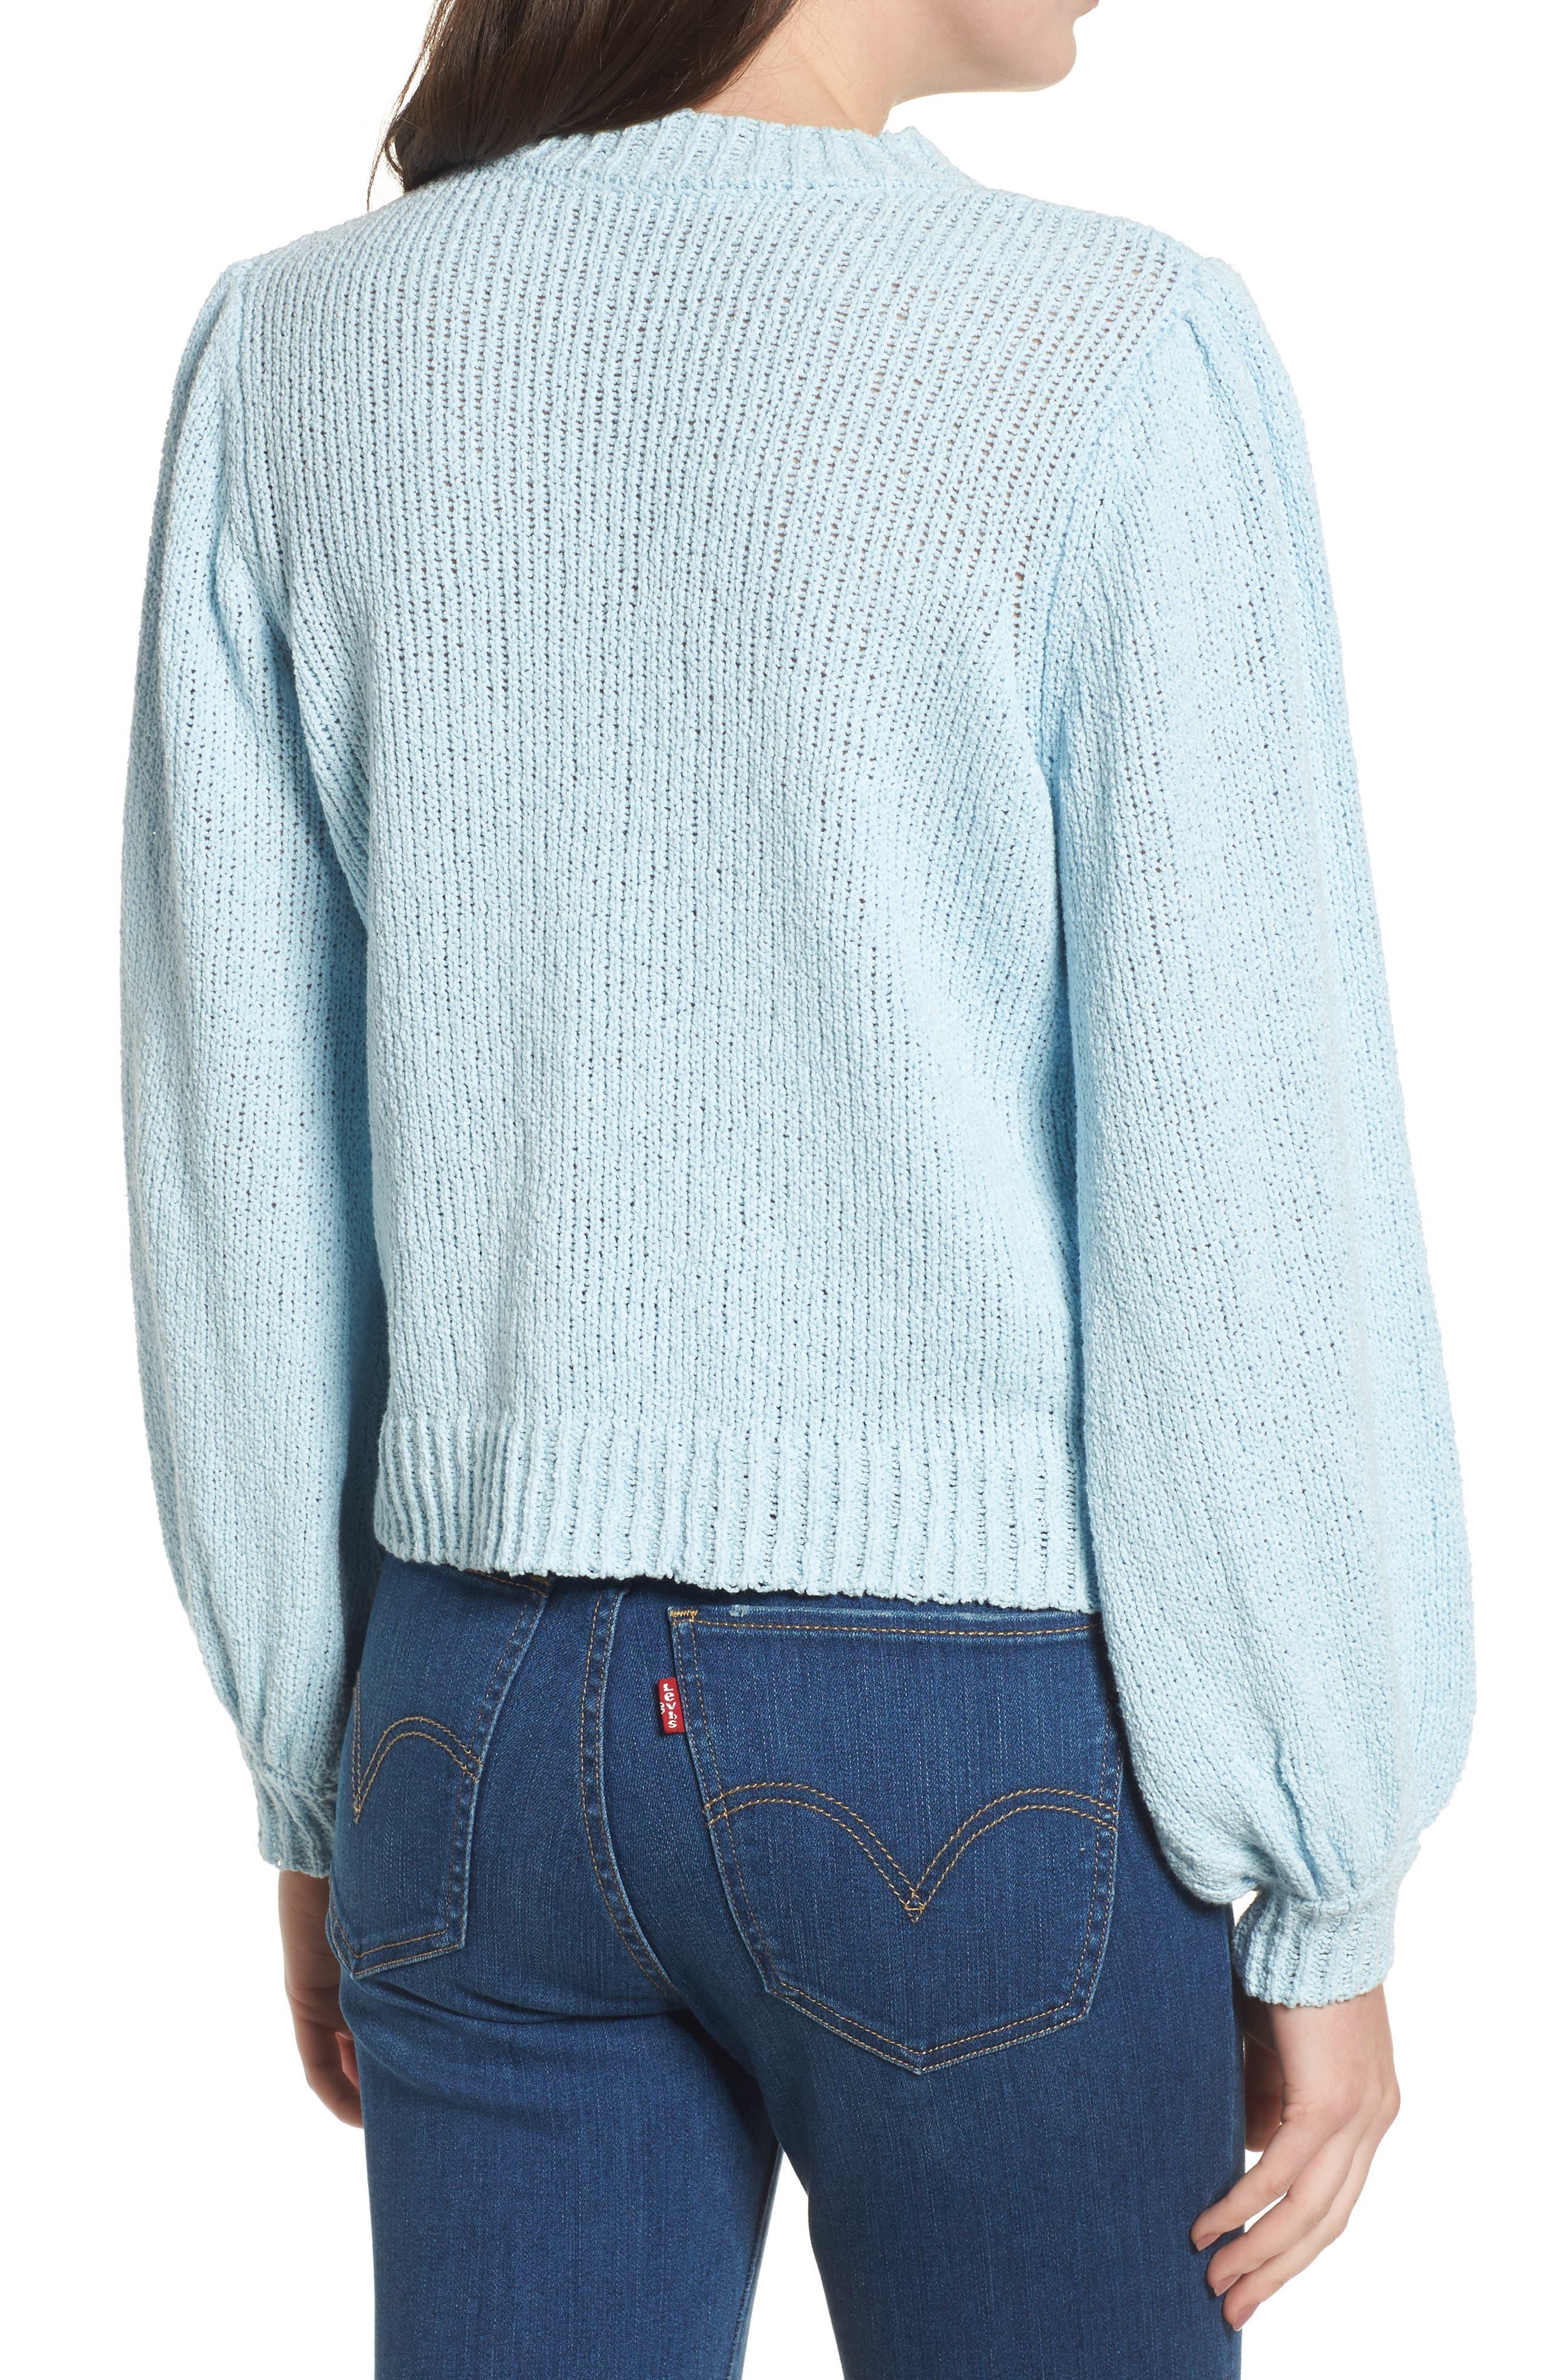 Blouson Sleeve Sweater,                             Alternate thumbnail 2, color,                             Blue Omphalodes